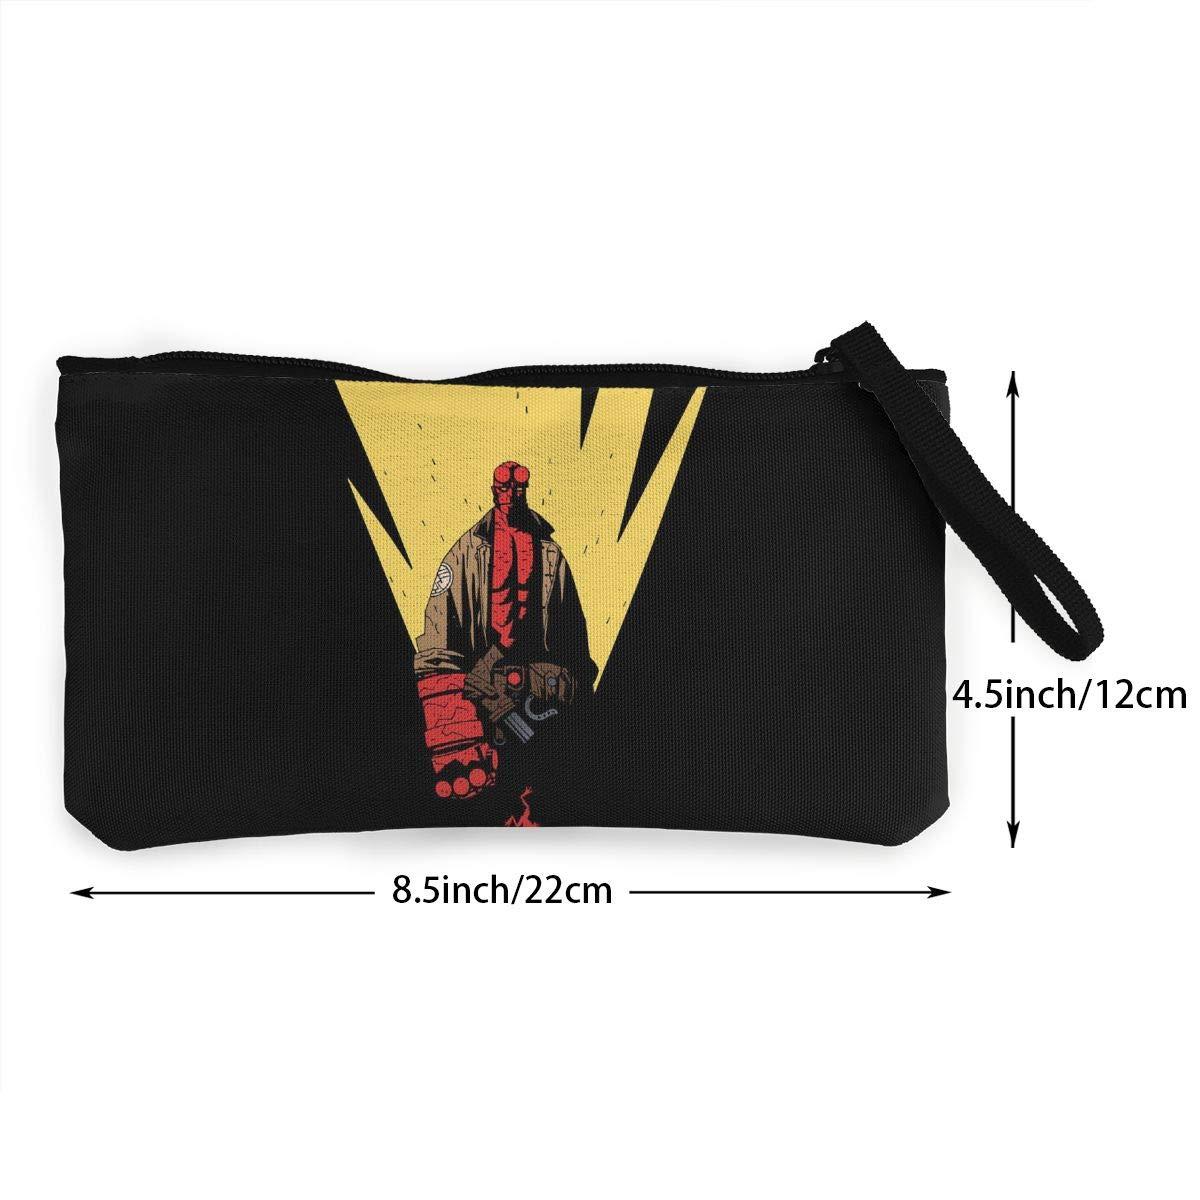 He-llboy Canvas Coin Purse Pouch Zipper Wristlet Wallet,Cellphone,Make Up Bag,Handle Key Holder